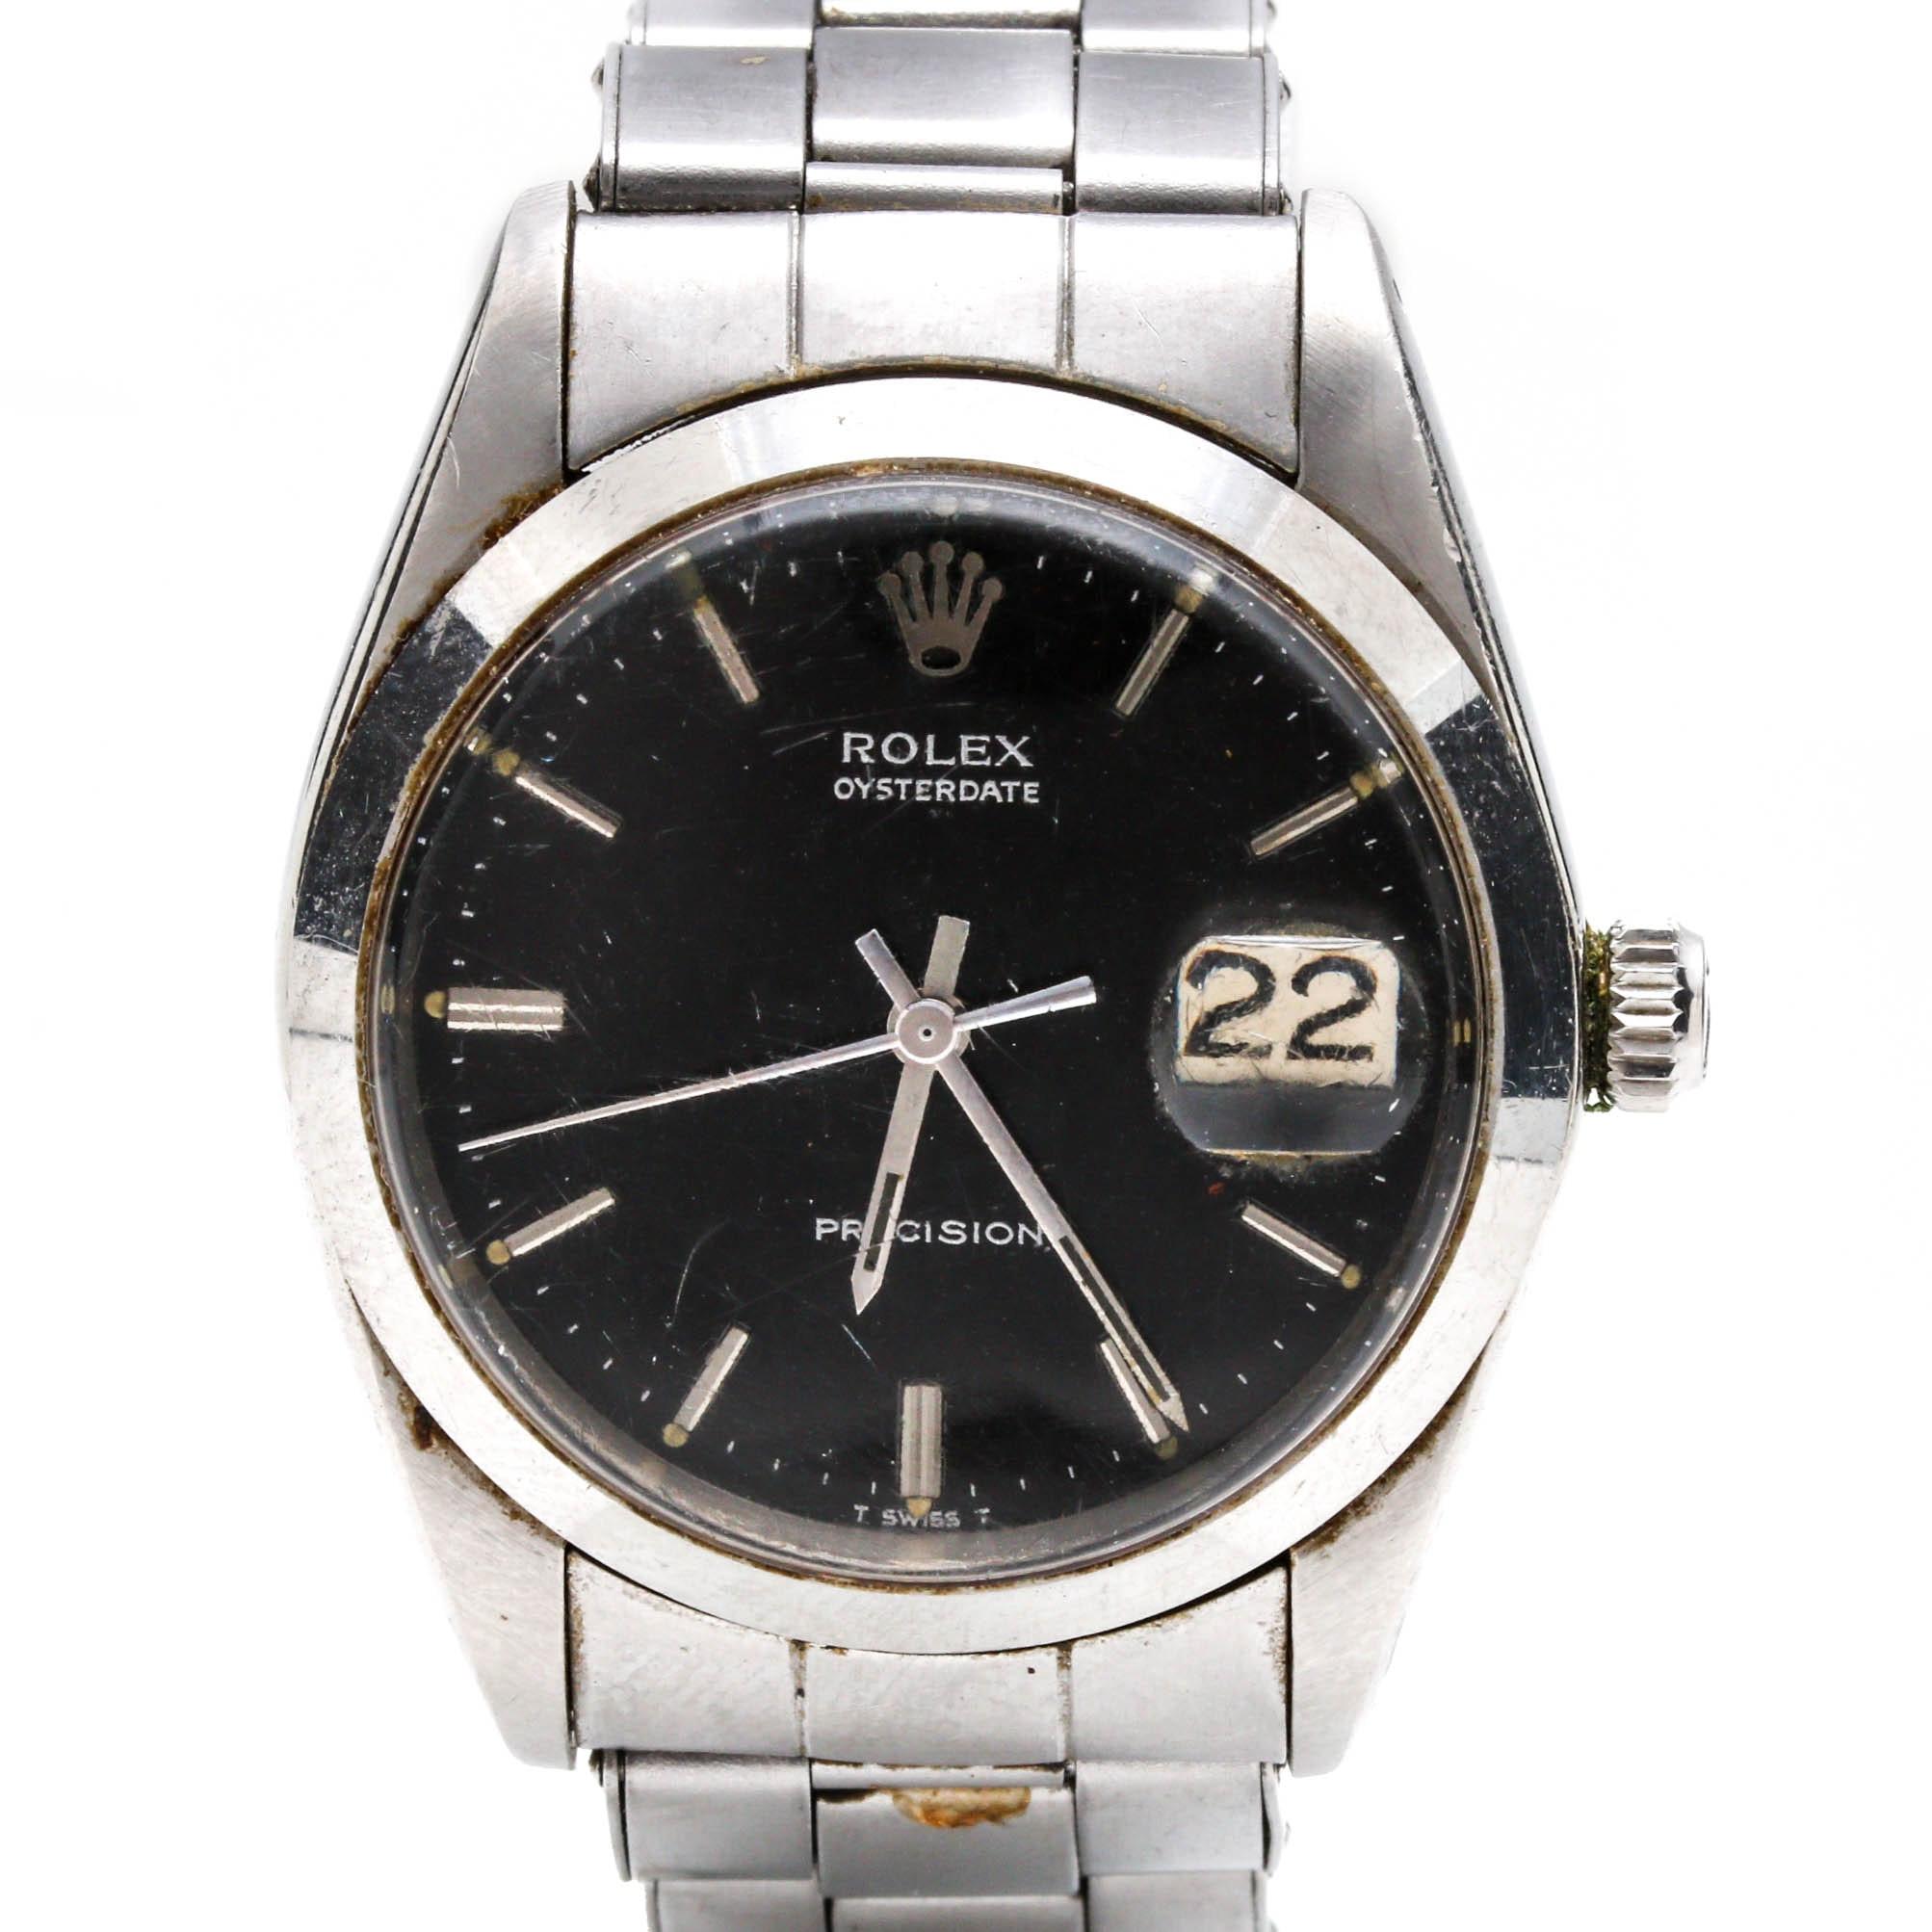 "Rolex ""Oysterdate Precision"" Wristwatch"